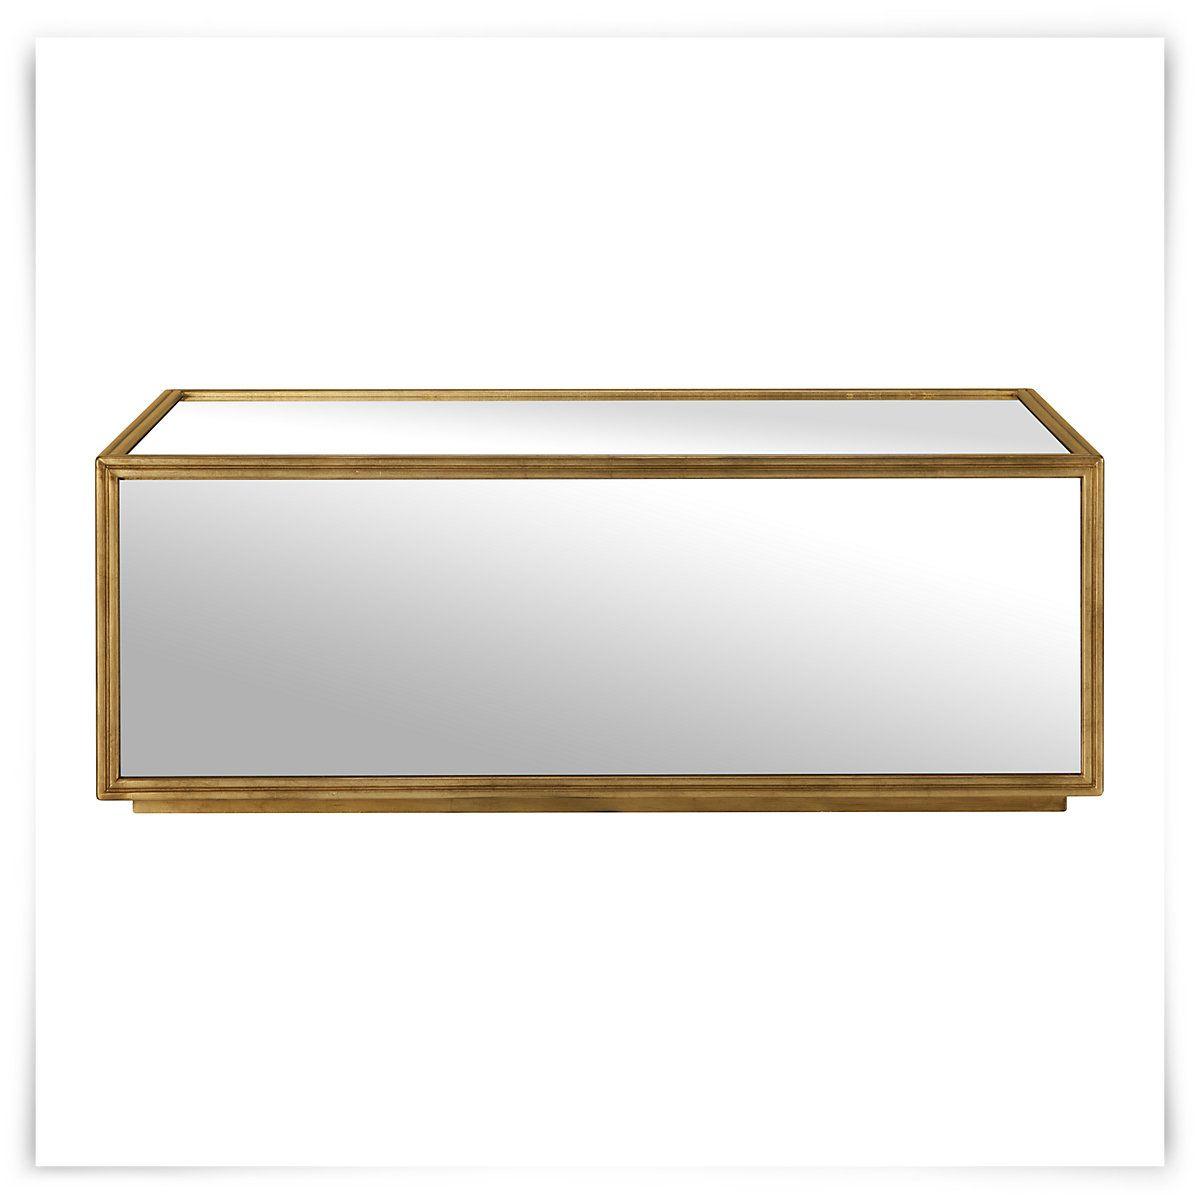 Jet Set Mirrored Rectangular Coffee Table 69995 Binks Living